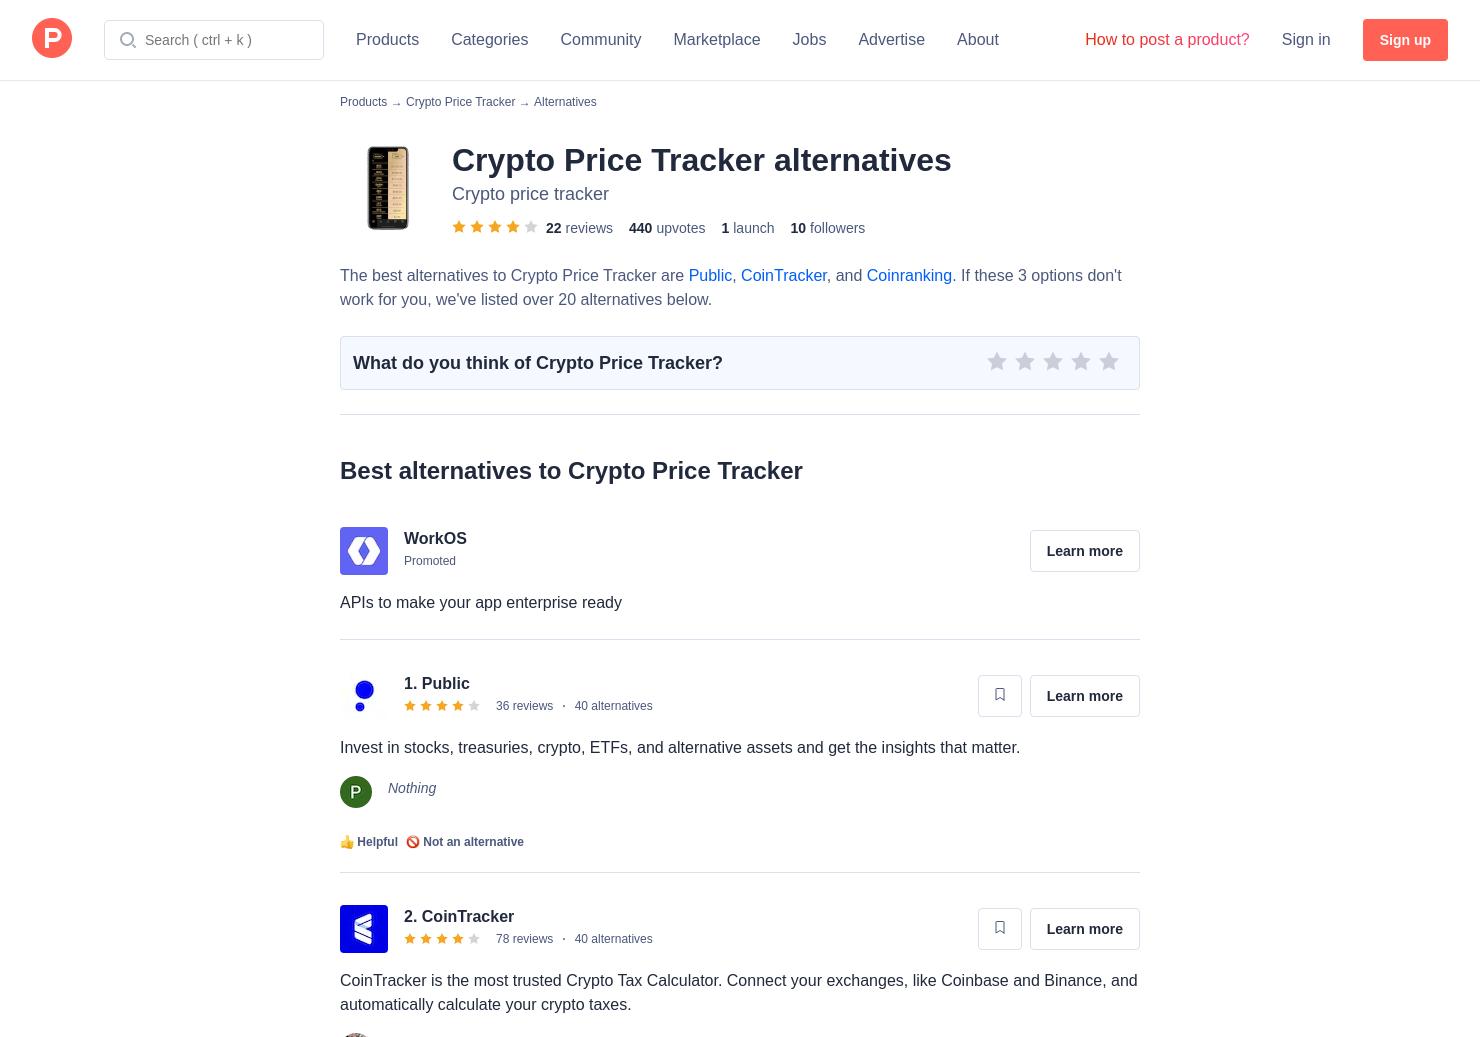 18 Alternatives to Crypto Price Tracker for iPhone, iPad